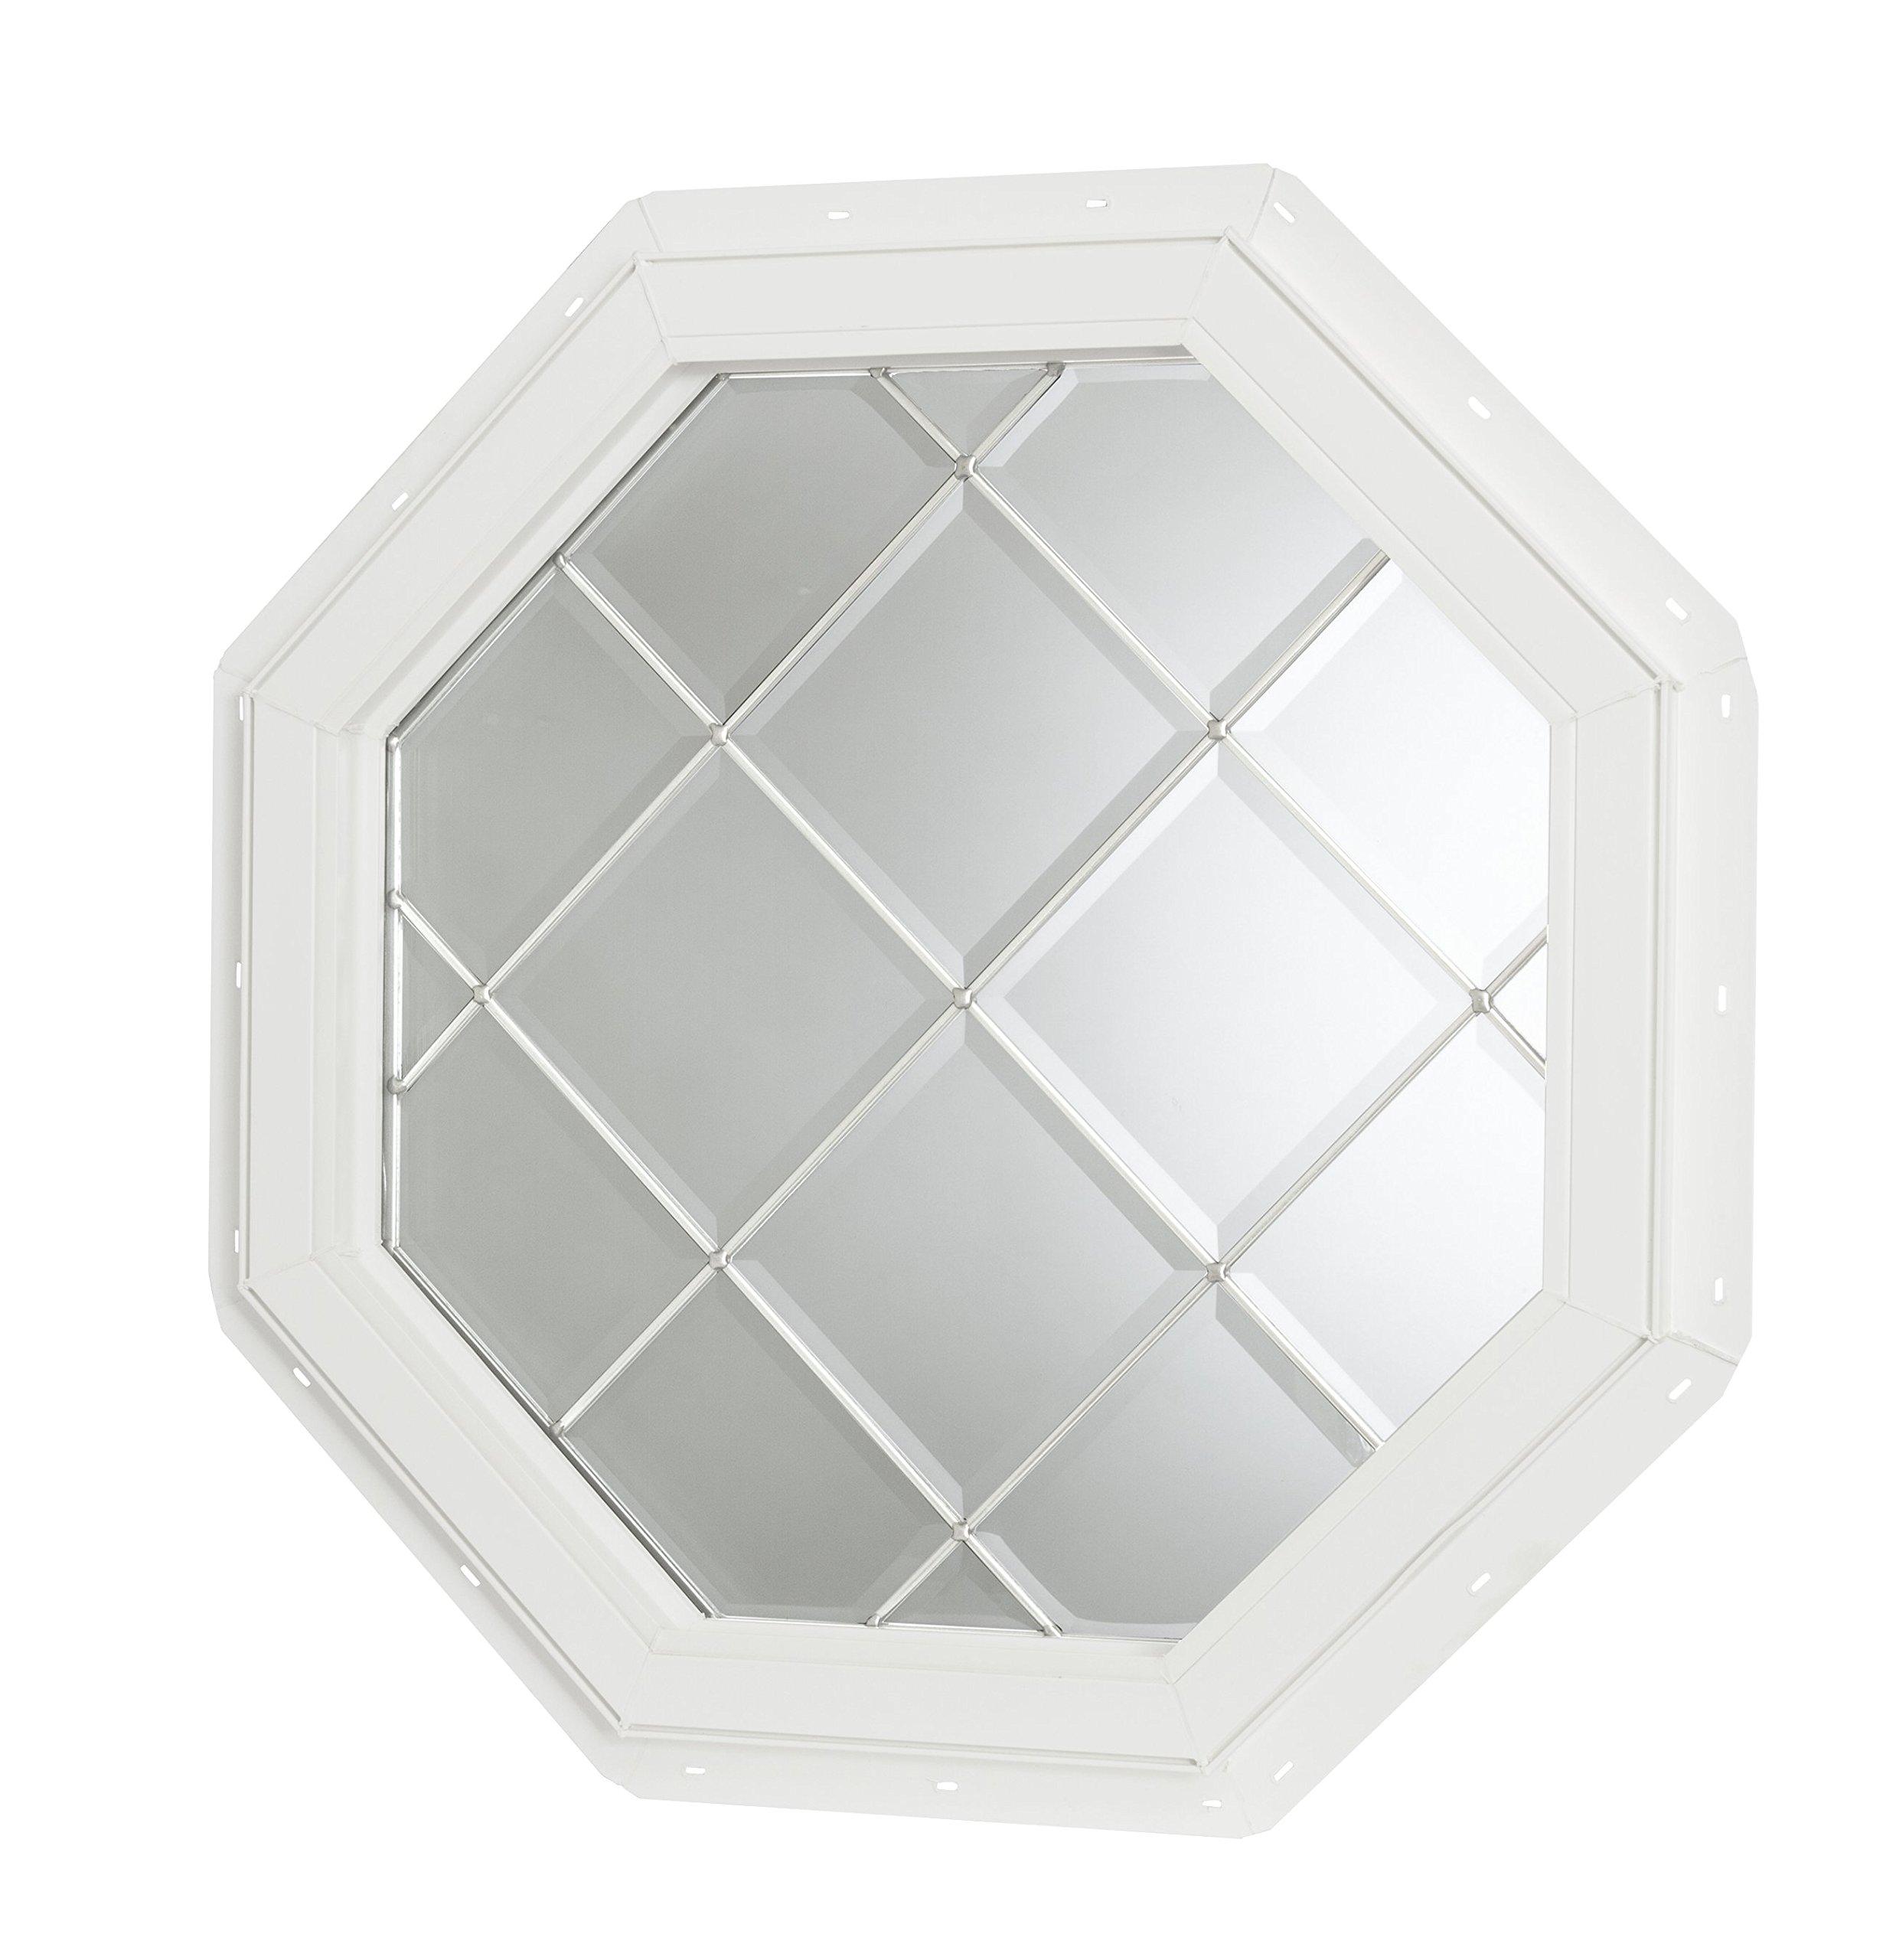 Park Ridge Vinyl Octagon Fixed Window with Platinum Geometric Diamond Grids & Triple Pane Beveled Glass, 22'' x 22''